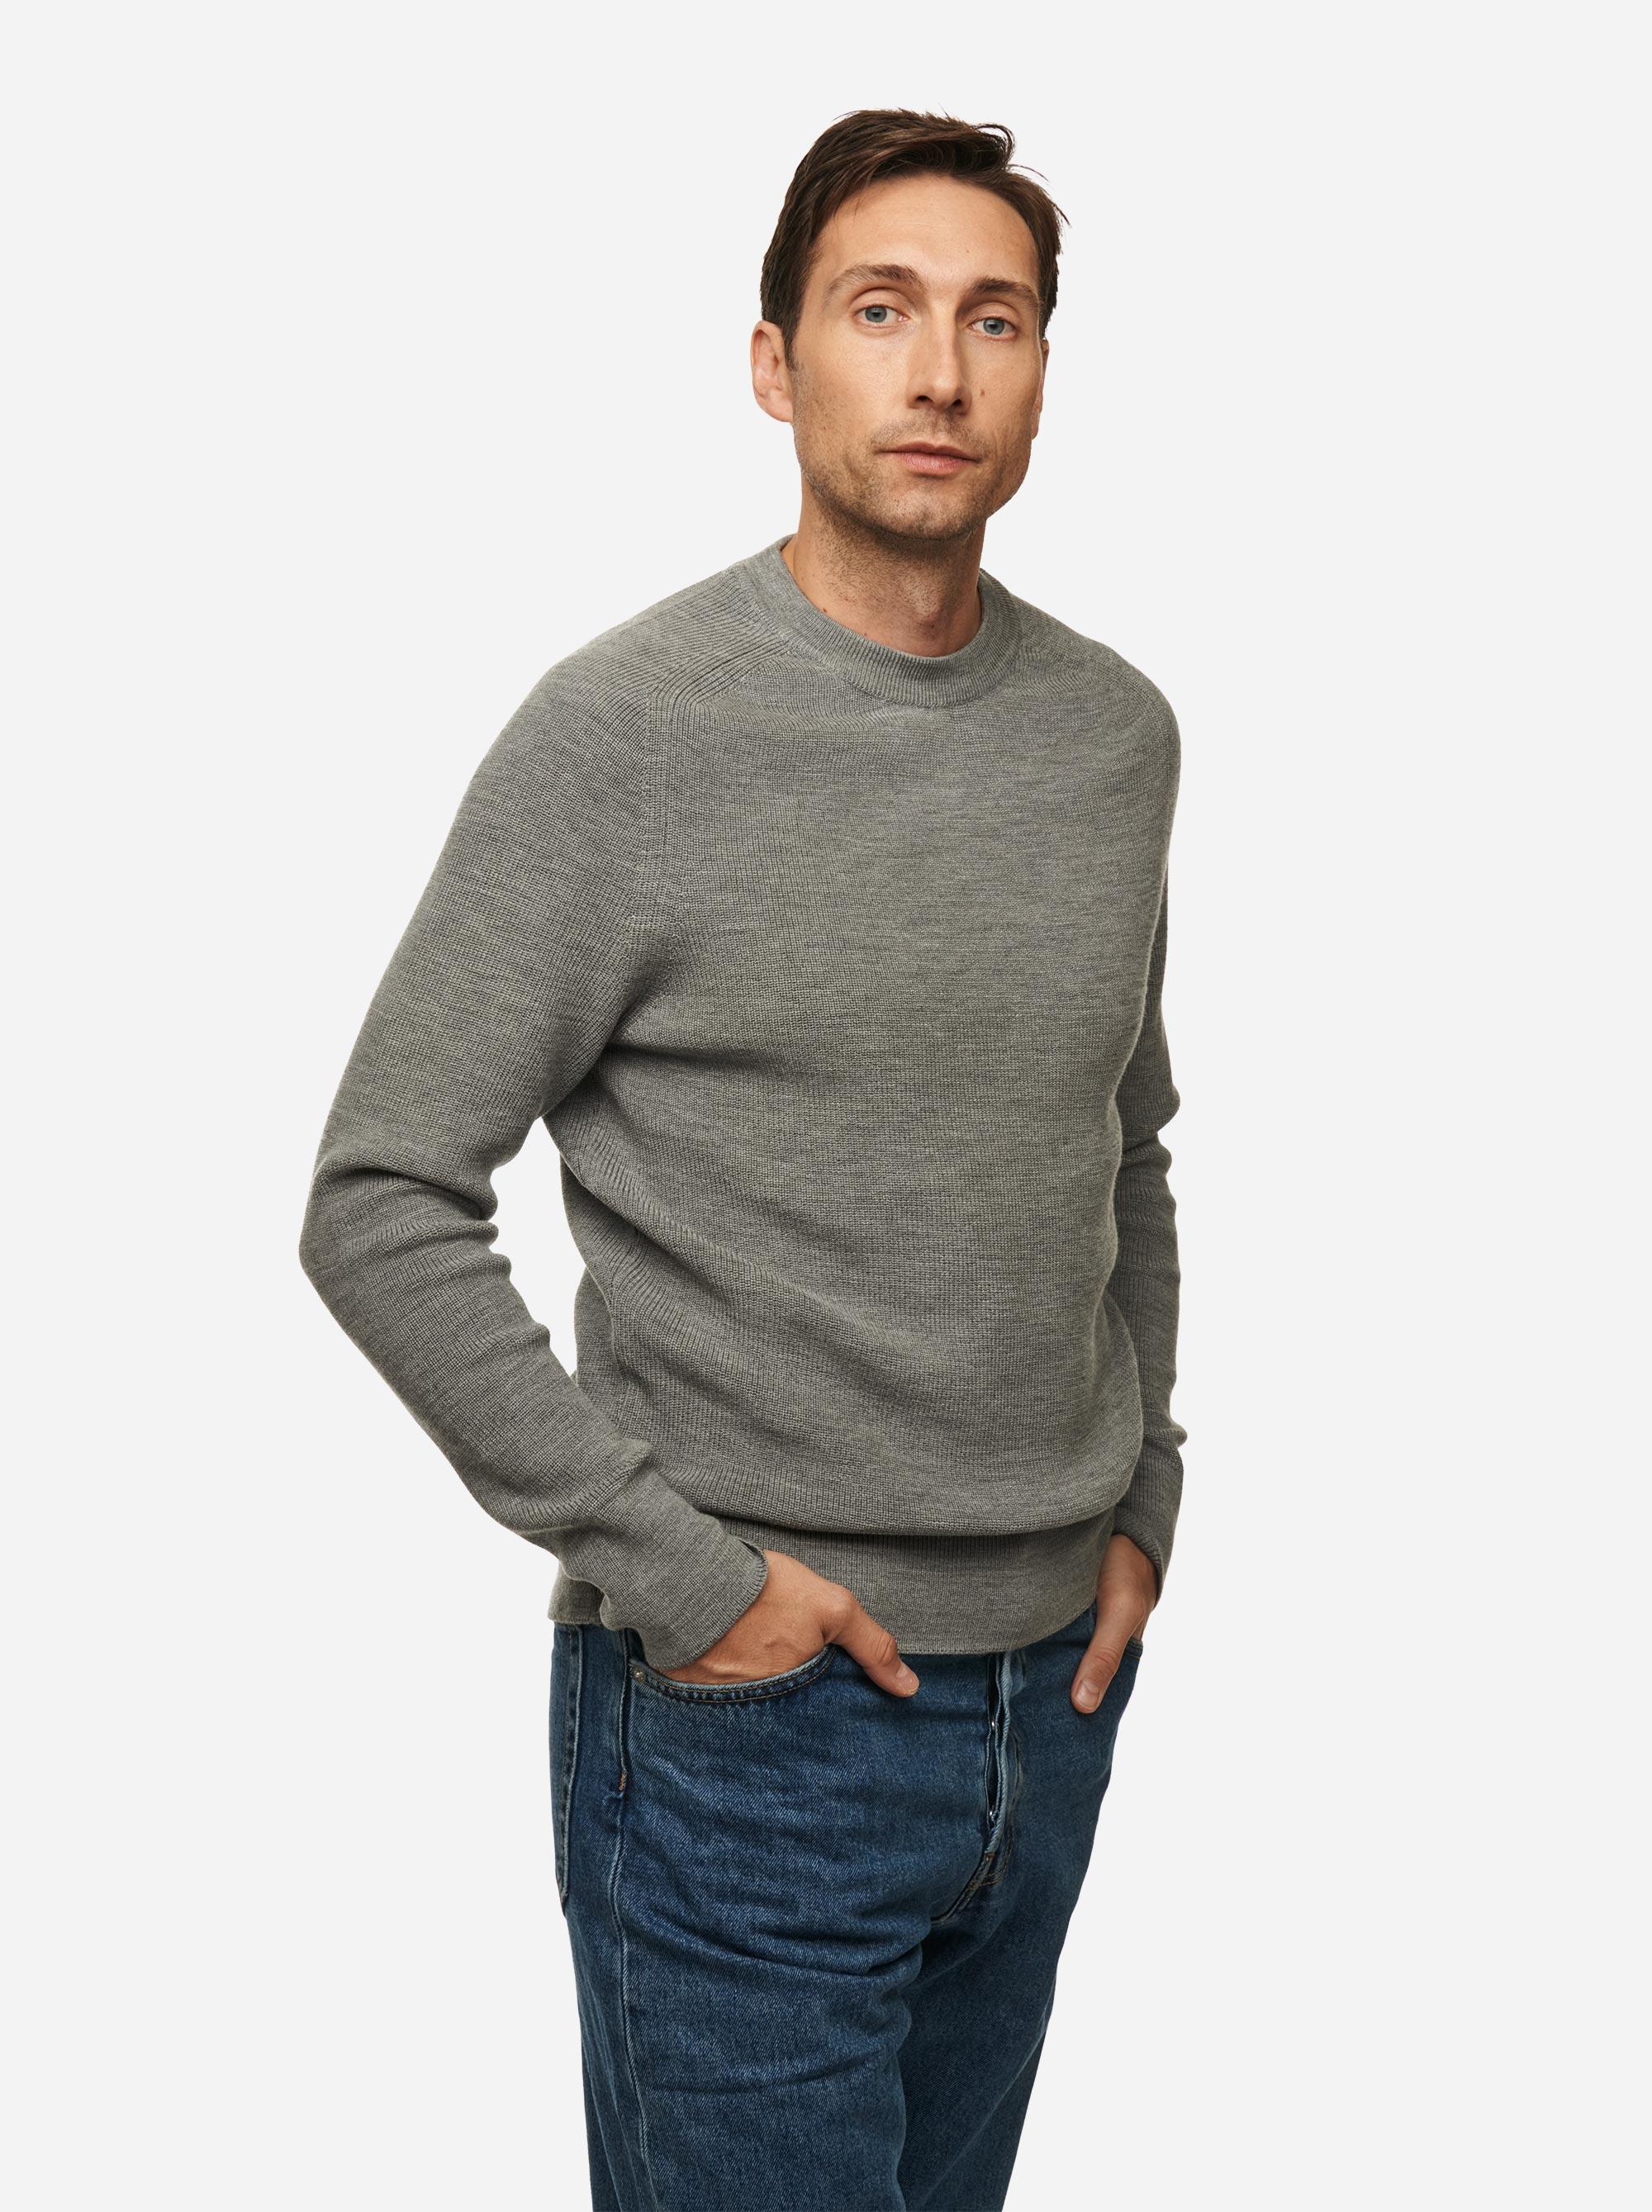 Teym - Crewneck - The Merino Sweater - Men - Grey - 4